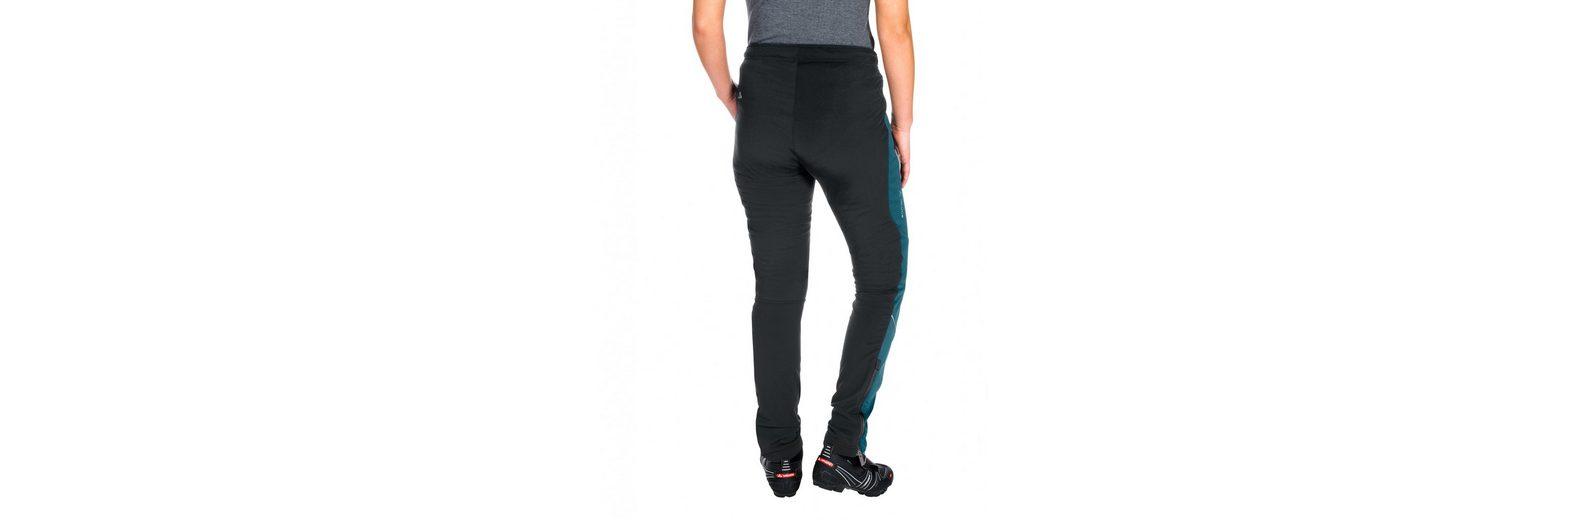 VAUDE Radhose Wintry III Pants Women Footaction Günstig Online Ctgg6XyCwo